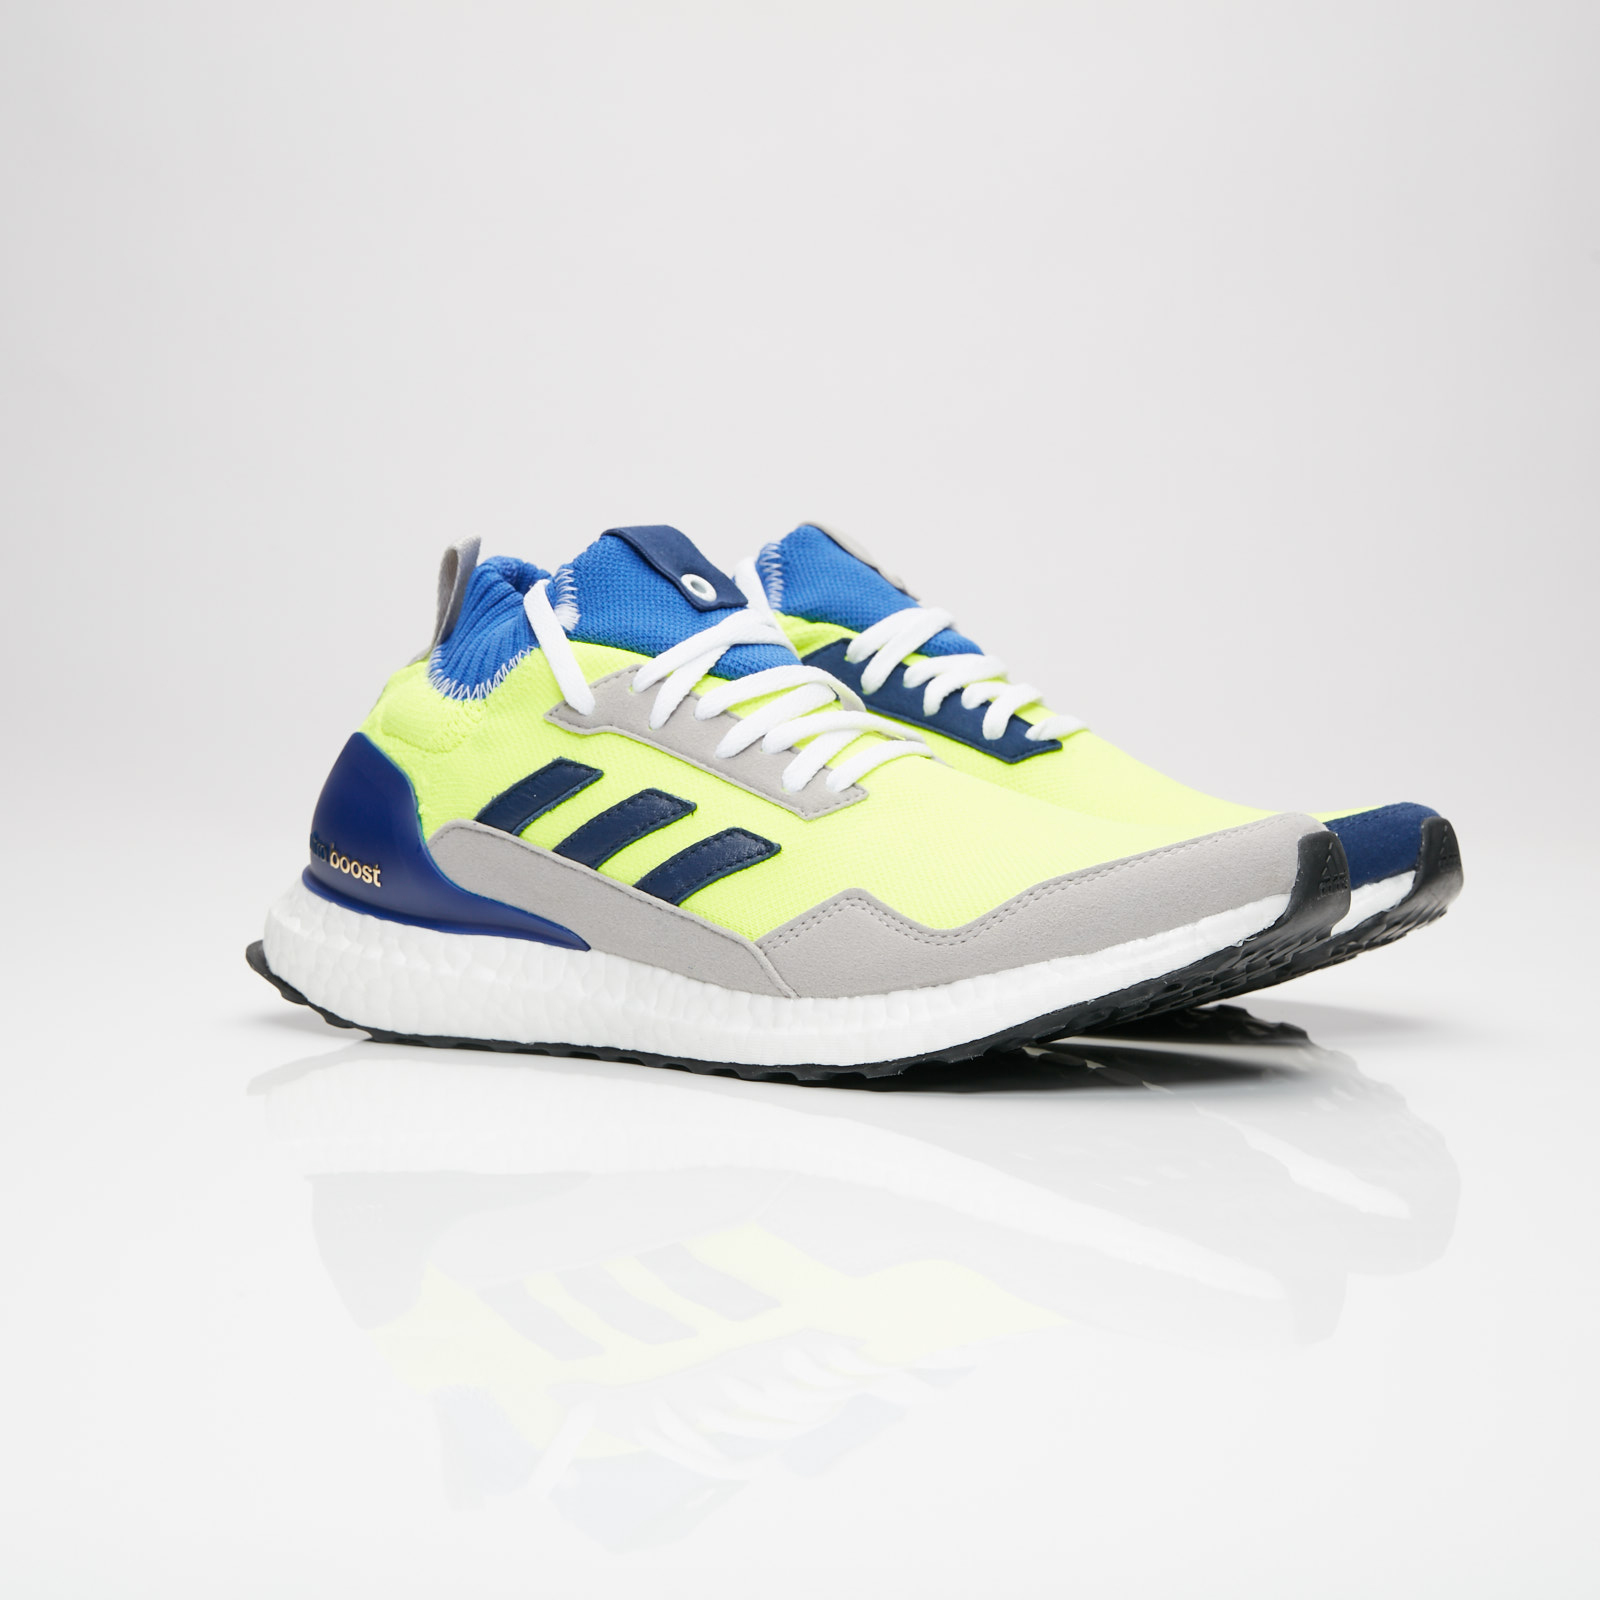 aebeb7b3c adidas Ultraboost Mid Proto - Bd7399 - Sneakersnstuff